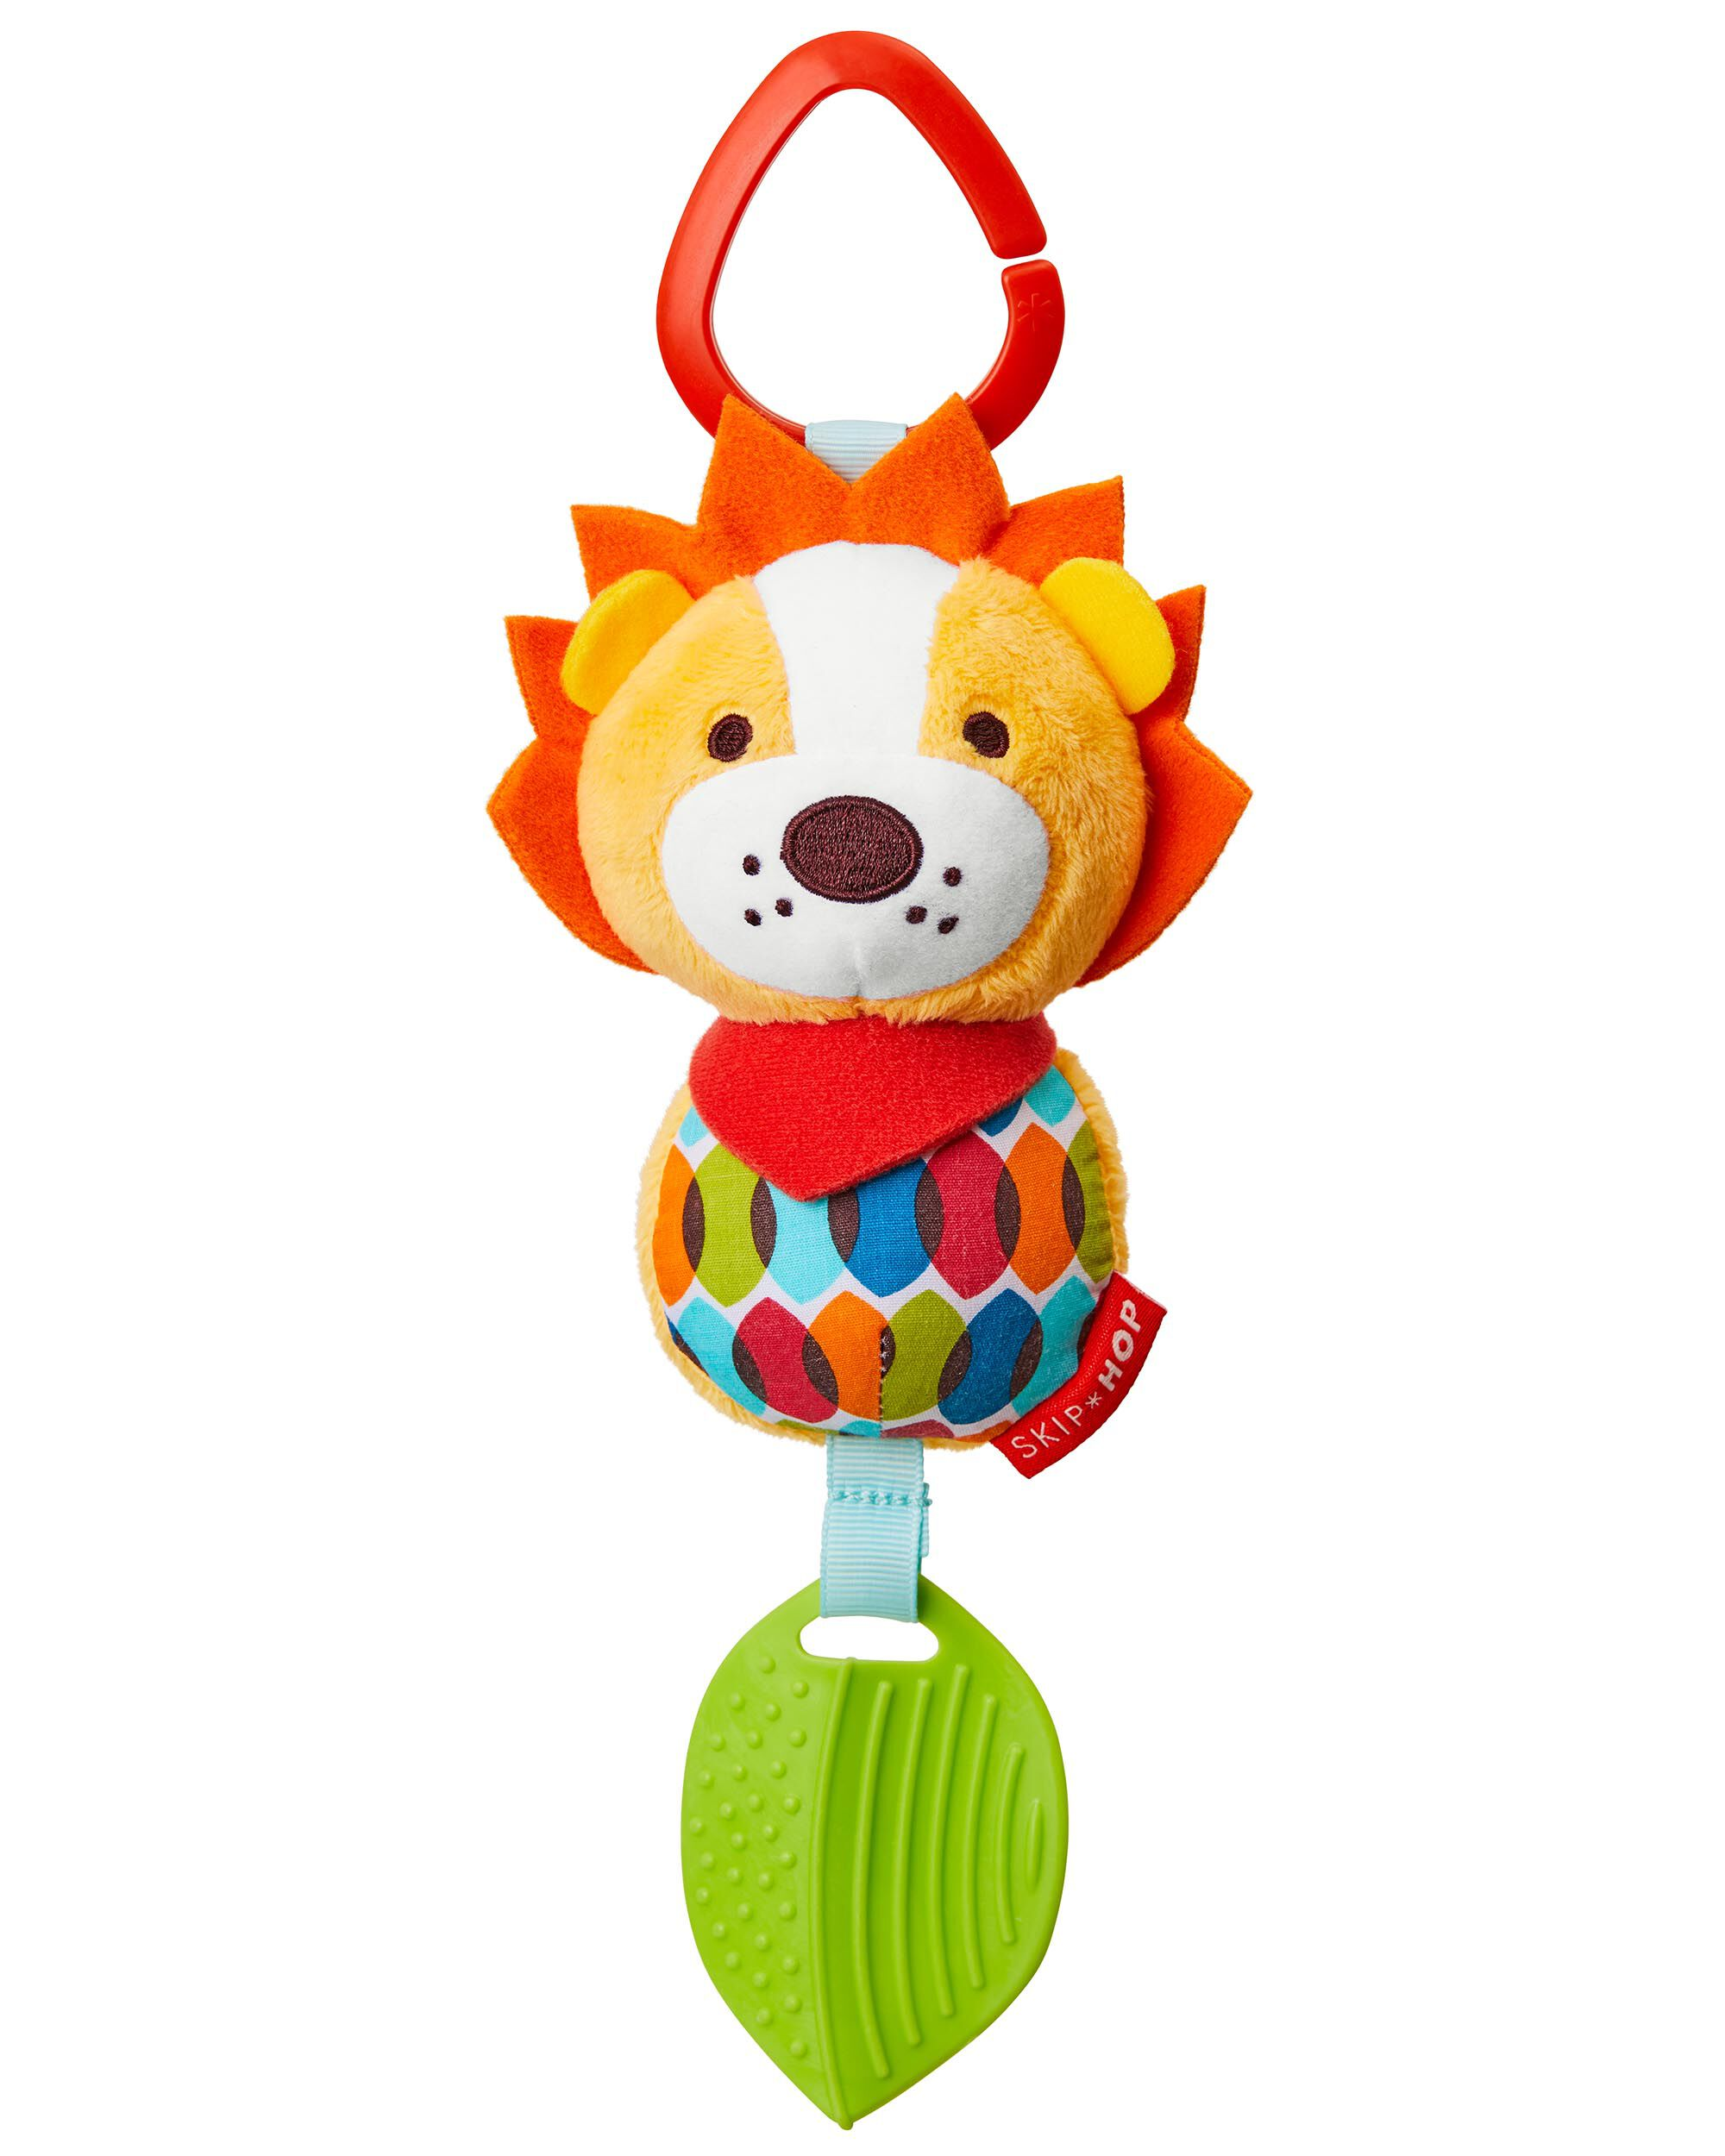 Oshkoshbgosh Bandana Buddies Chime & Teethe Toy